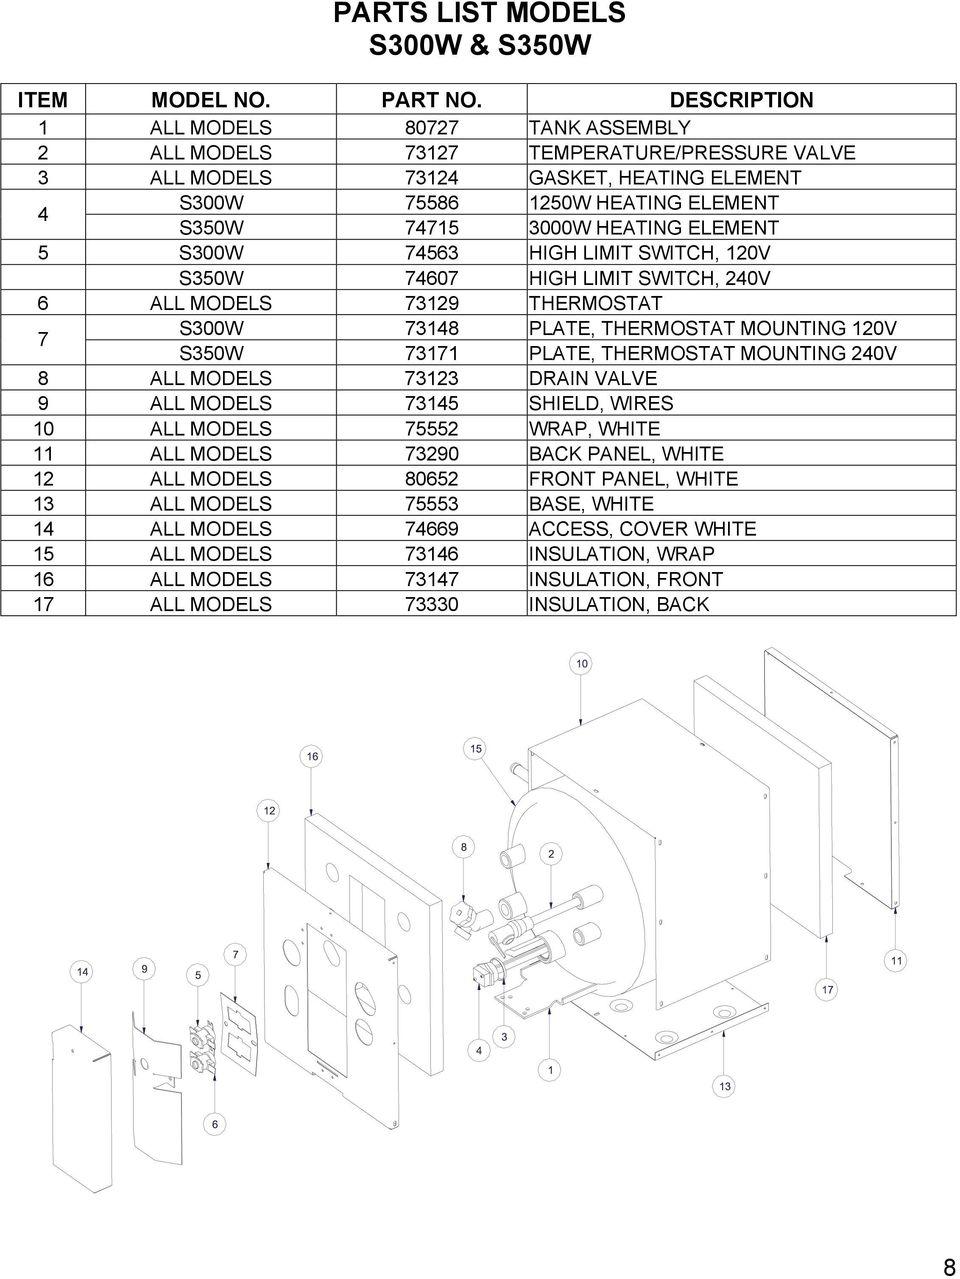 medium resolution of element 5 s300w 74563 high limit switch 120v s350w 74607 high limit switch 240v